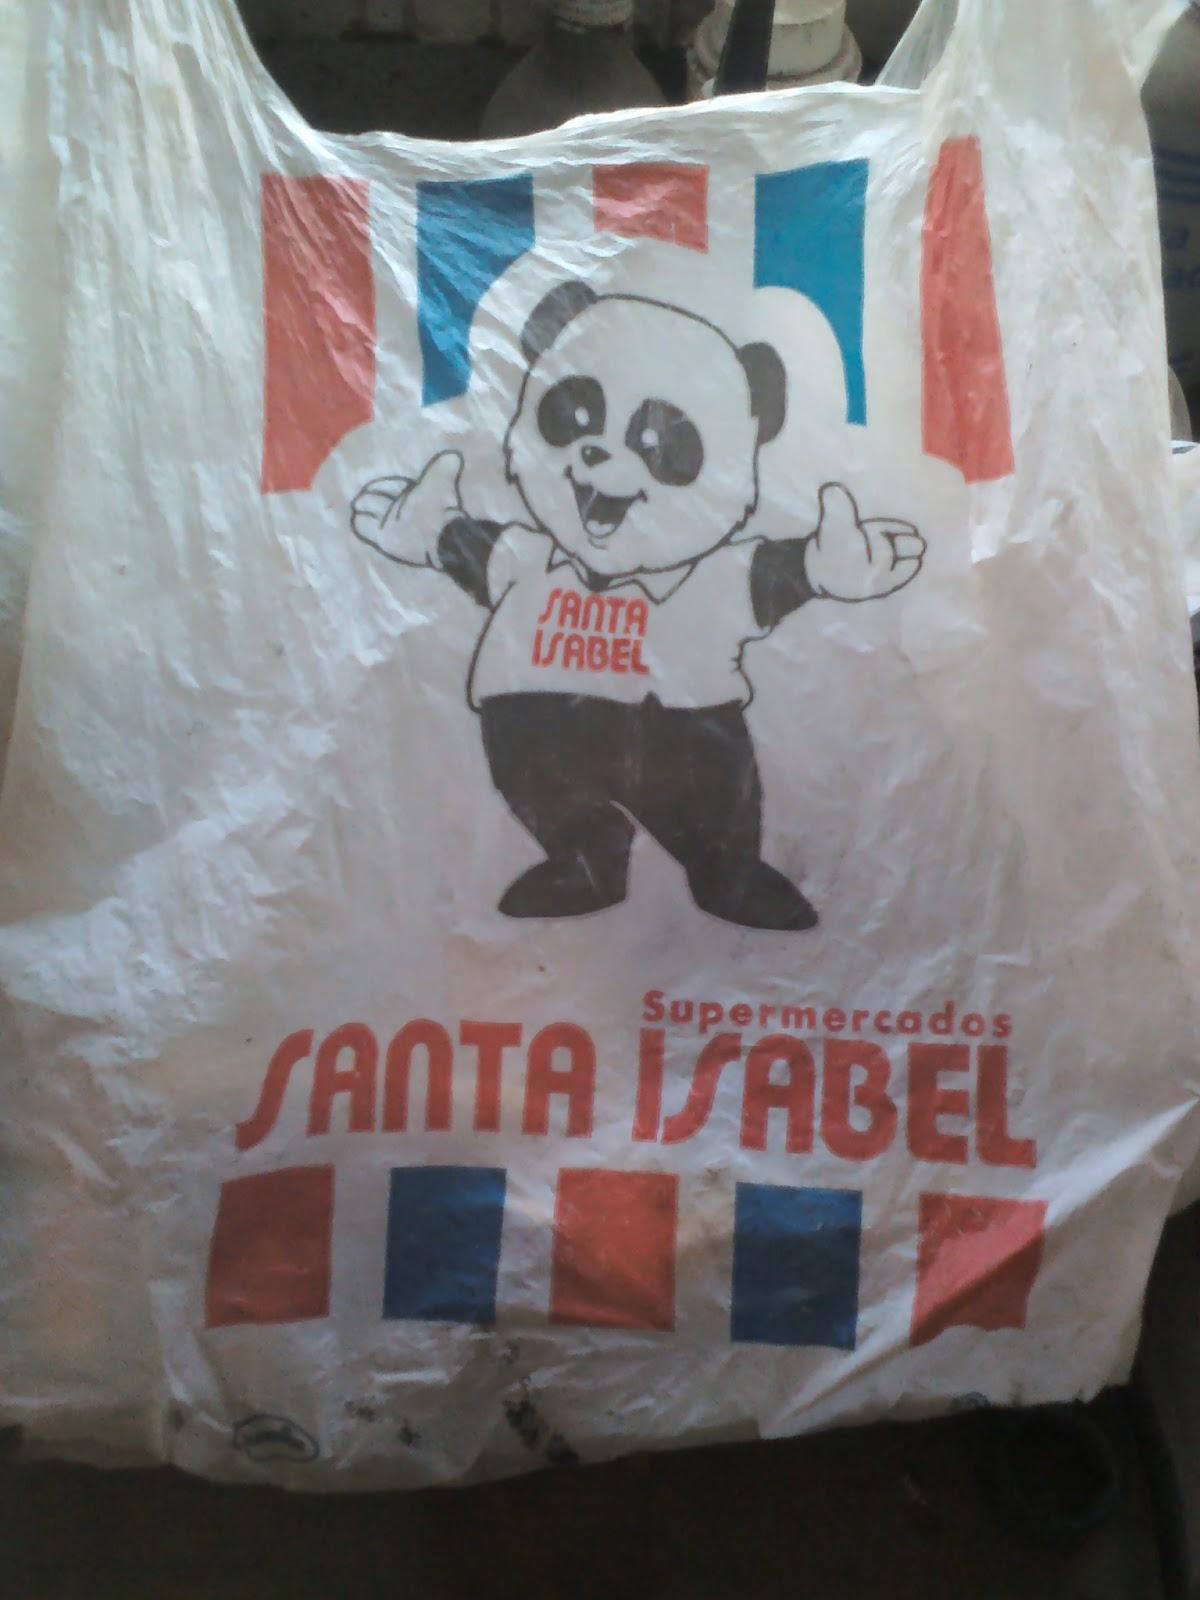 8930cdbe5 Santa Isabel (Bolsa Supermercado) | Diseño Viejito